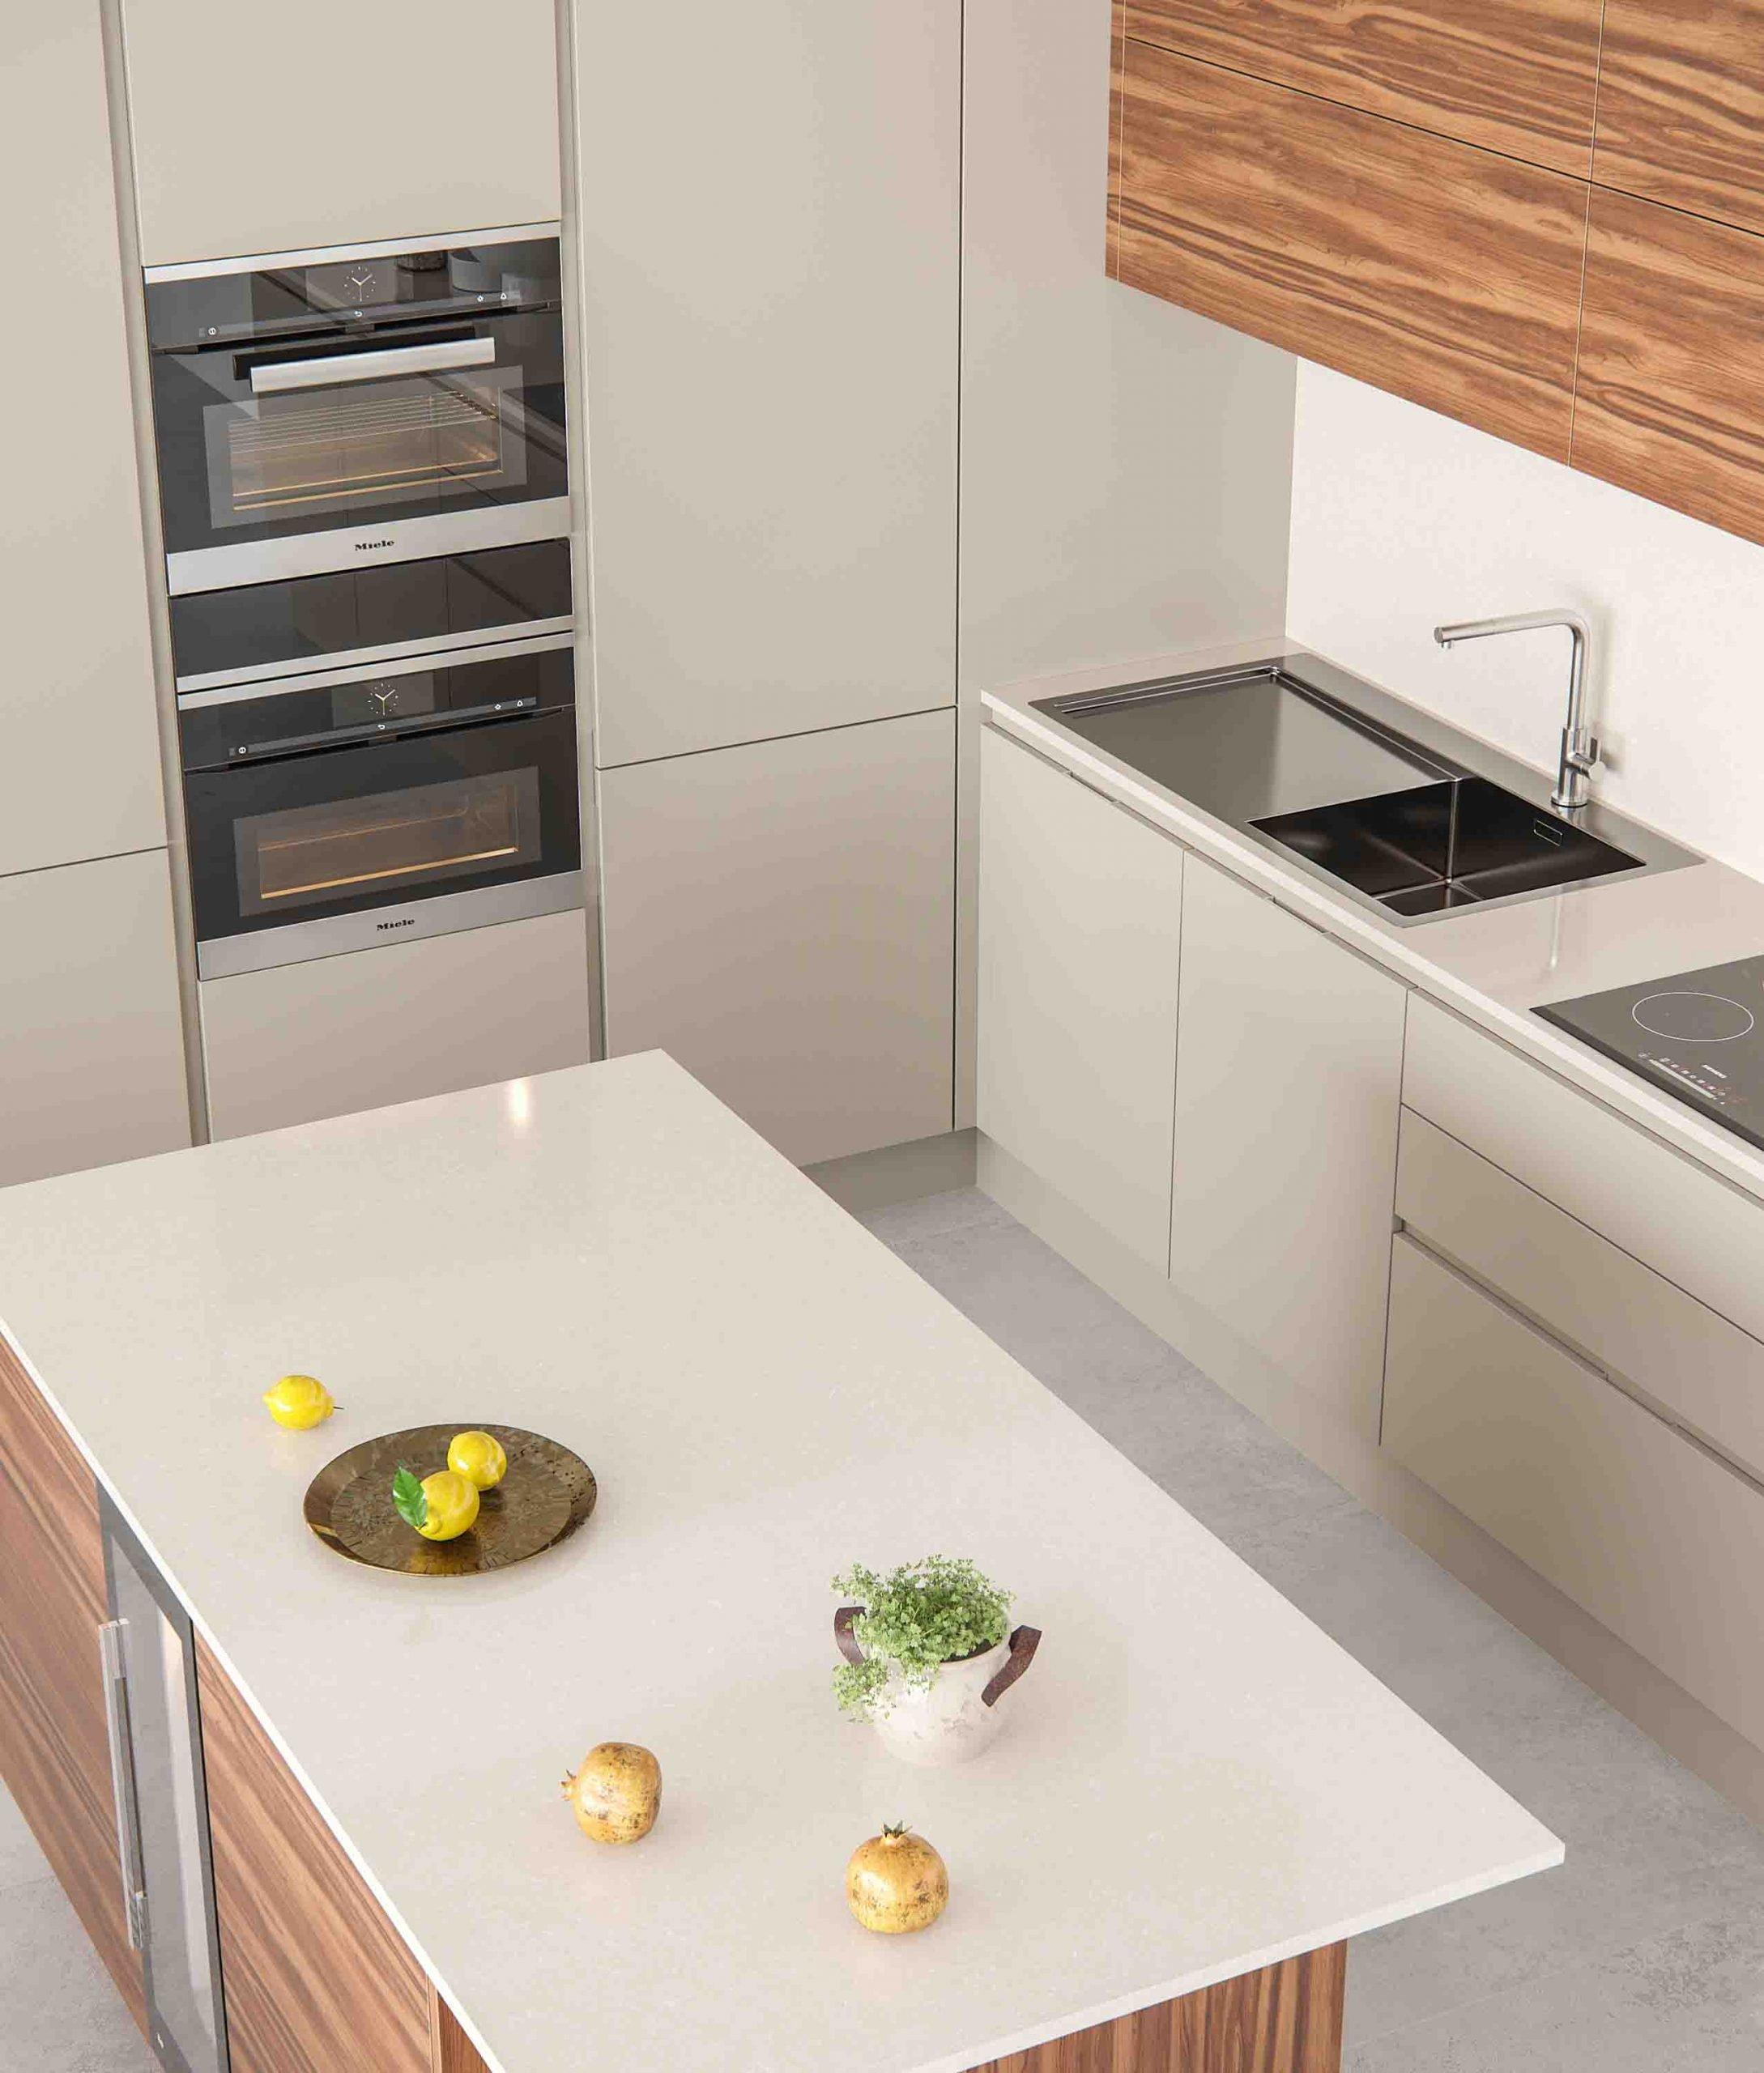 https://dprostudio.com/wp-content/uploads/2021/01/GRIXTI01_kitchen_mediterranea_hq_cam2-scaled.jpg